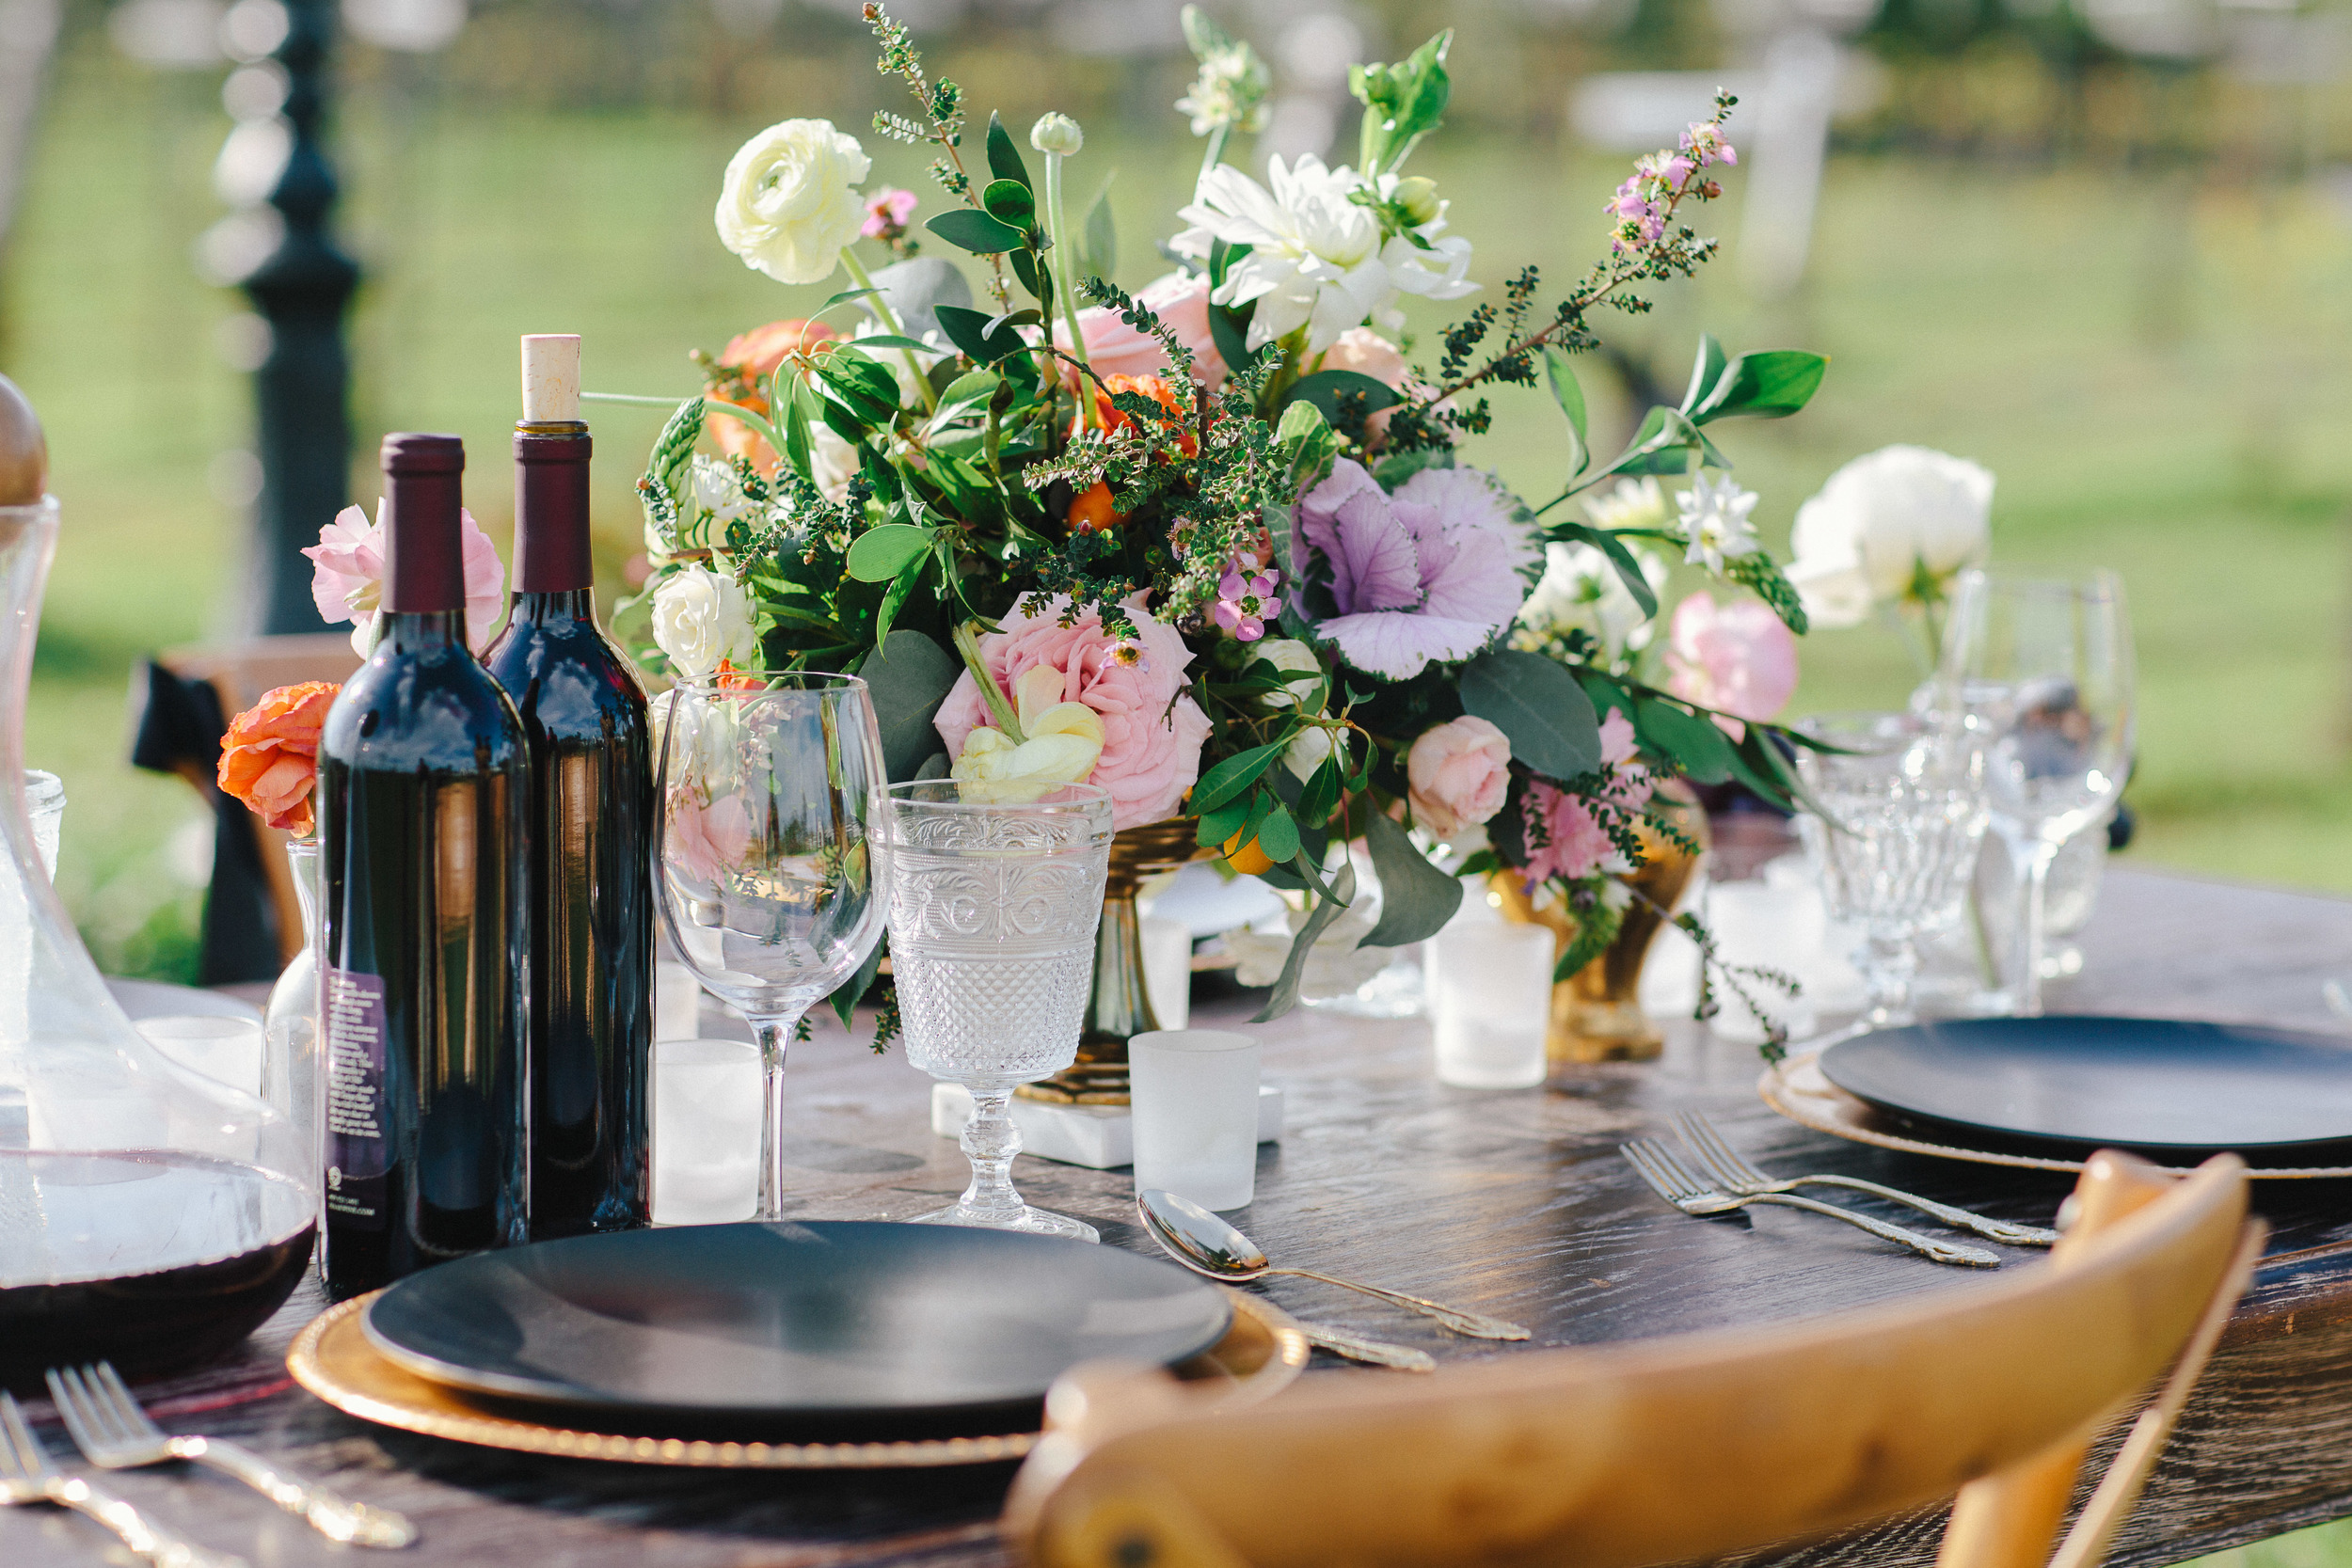 Maxit Flower Design; Vineyard Bridal Styled Shoot 0321_Kristen Curette Photography.jpg